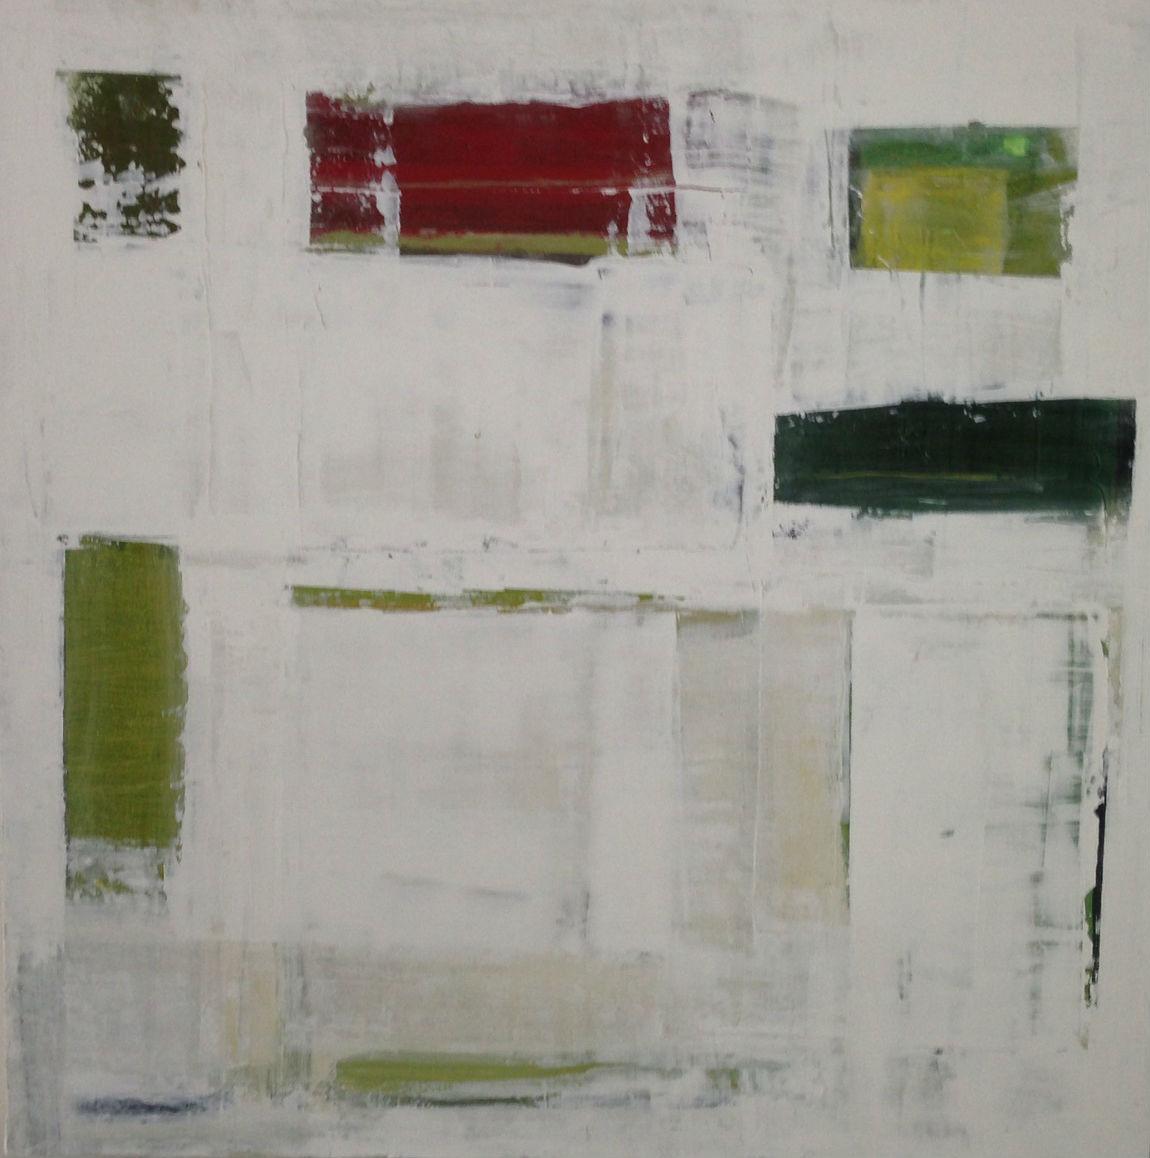 Interior Abstract No. 1